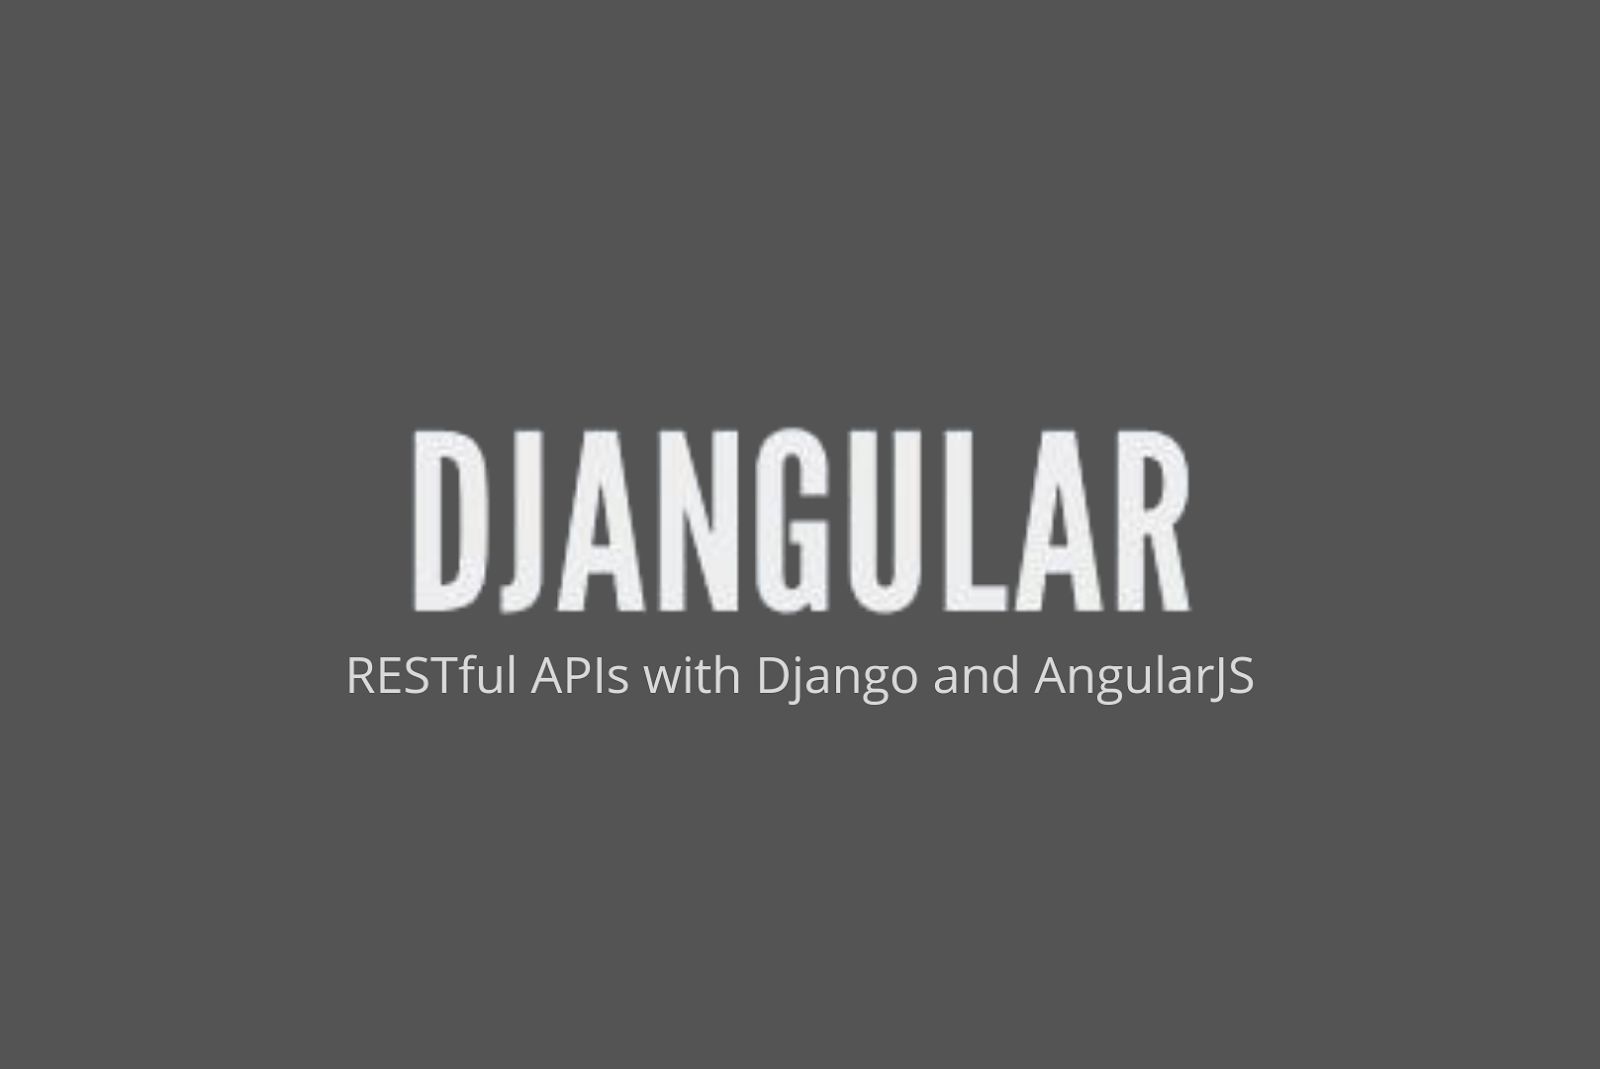 Djangular AngularJS Tools for Developers